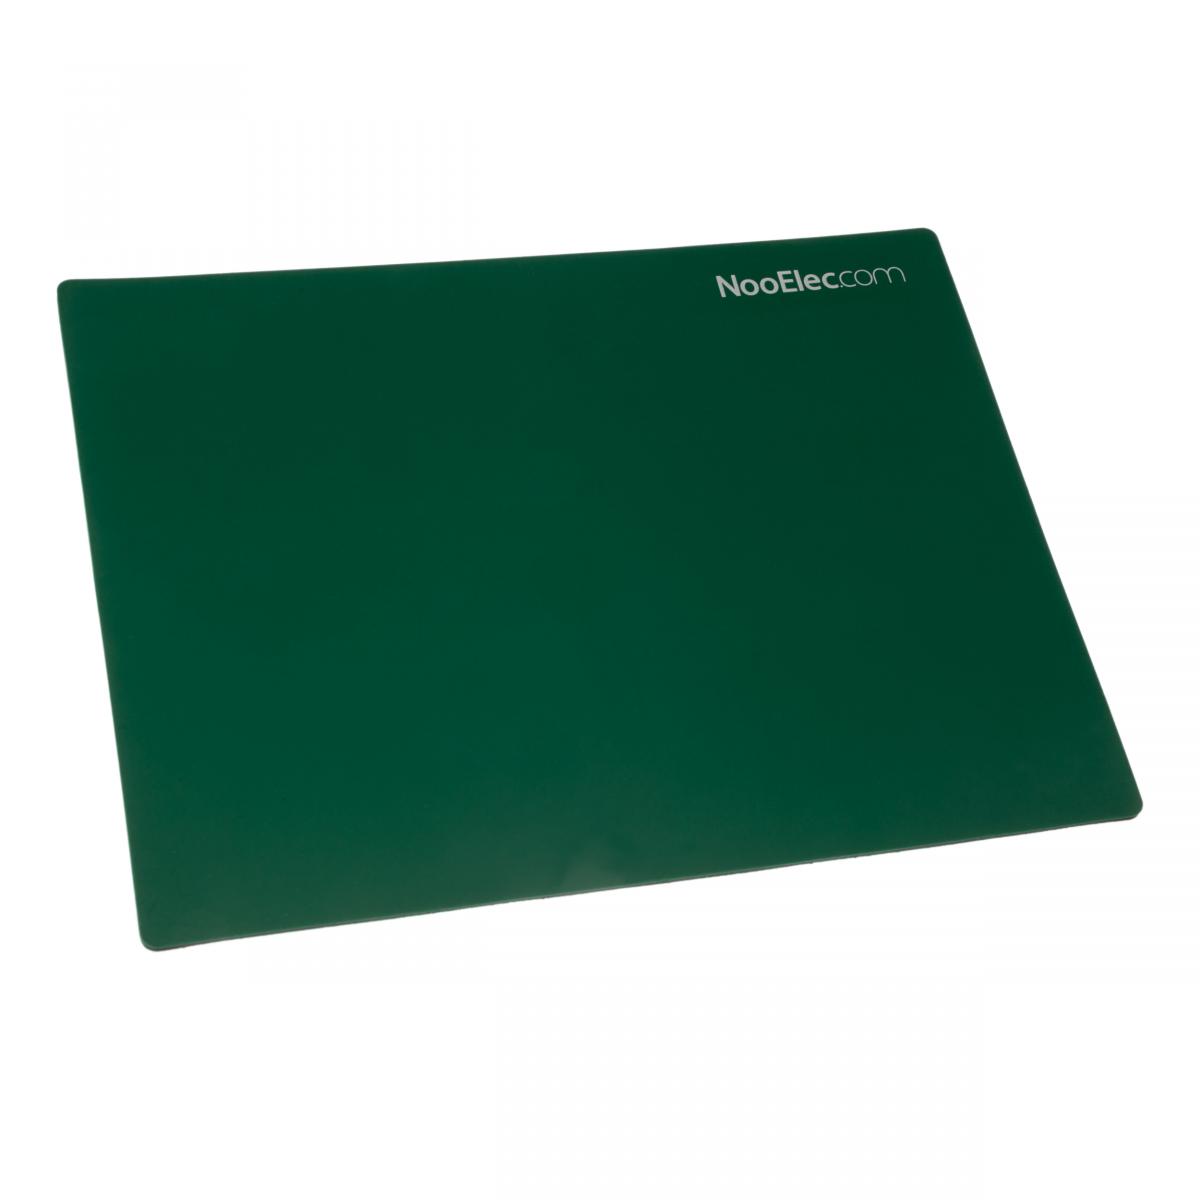 Nooelec Soldering And Circuit Repair Mat 12 X 9 30cm Rcuit 23cm